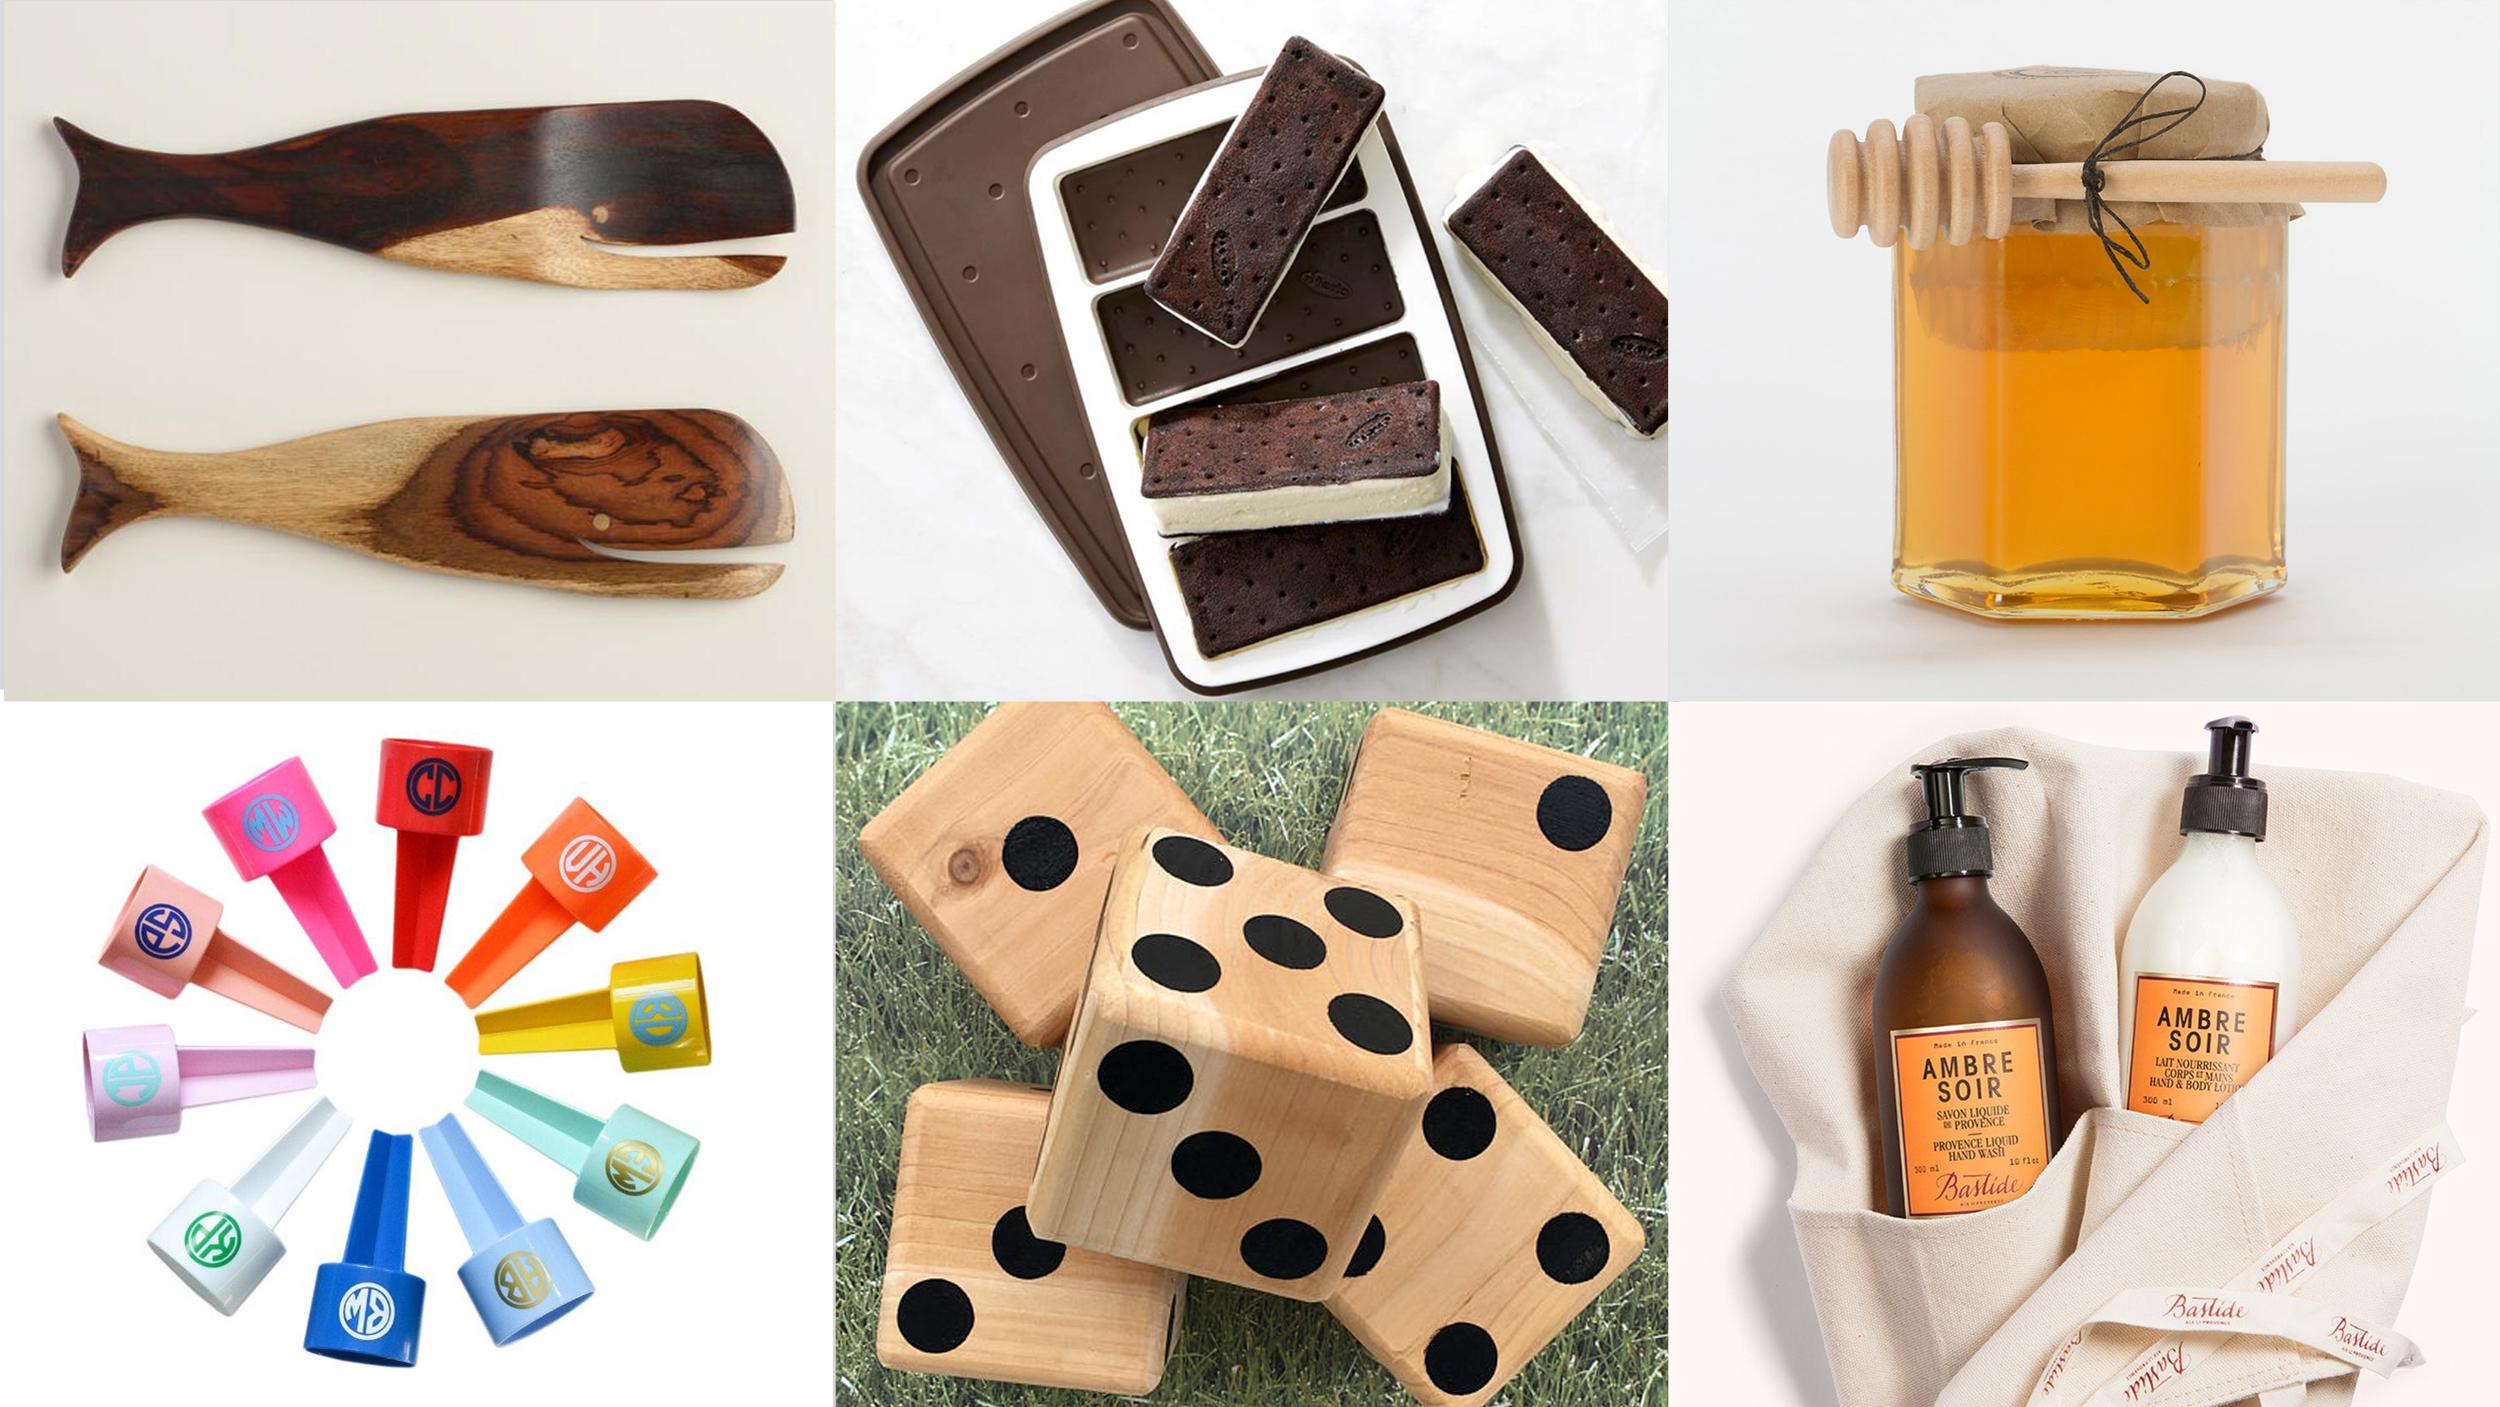 Hostess Gift Unique Hostess Gifts Diy Ice Cream Maker Sangria Kit More